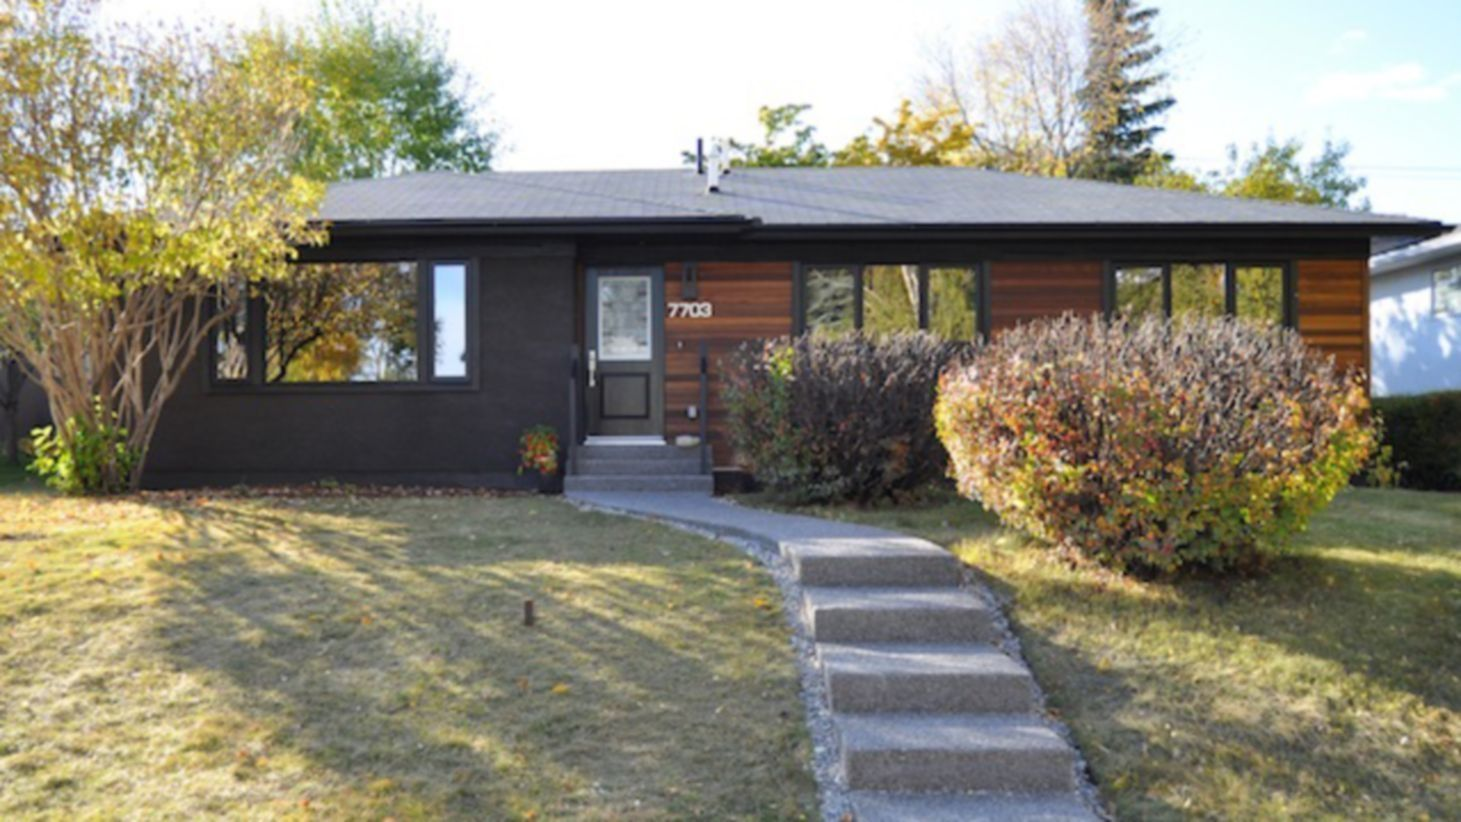 46 Most Beautiful Mid Century Modern Backyard Design Ideas